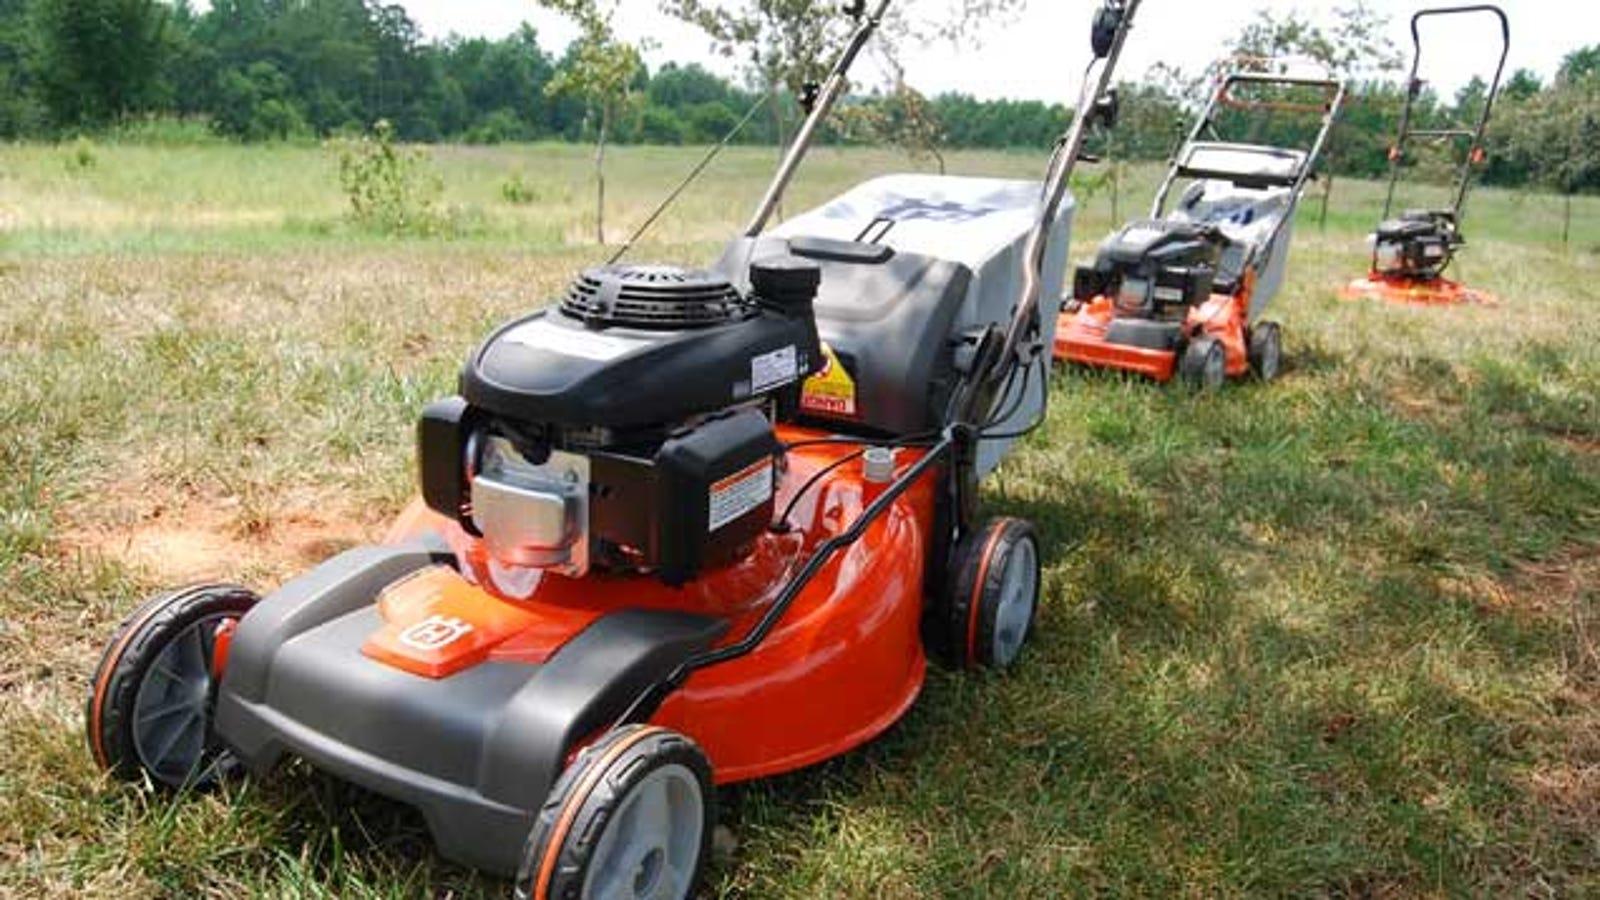 How to choose a quality gasoline mower 85